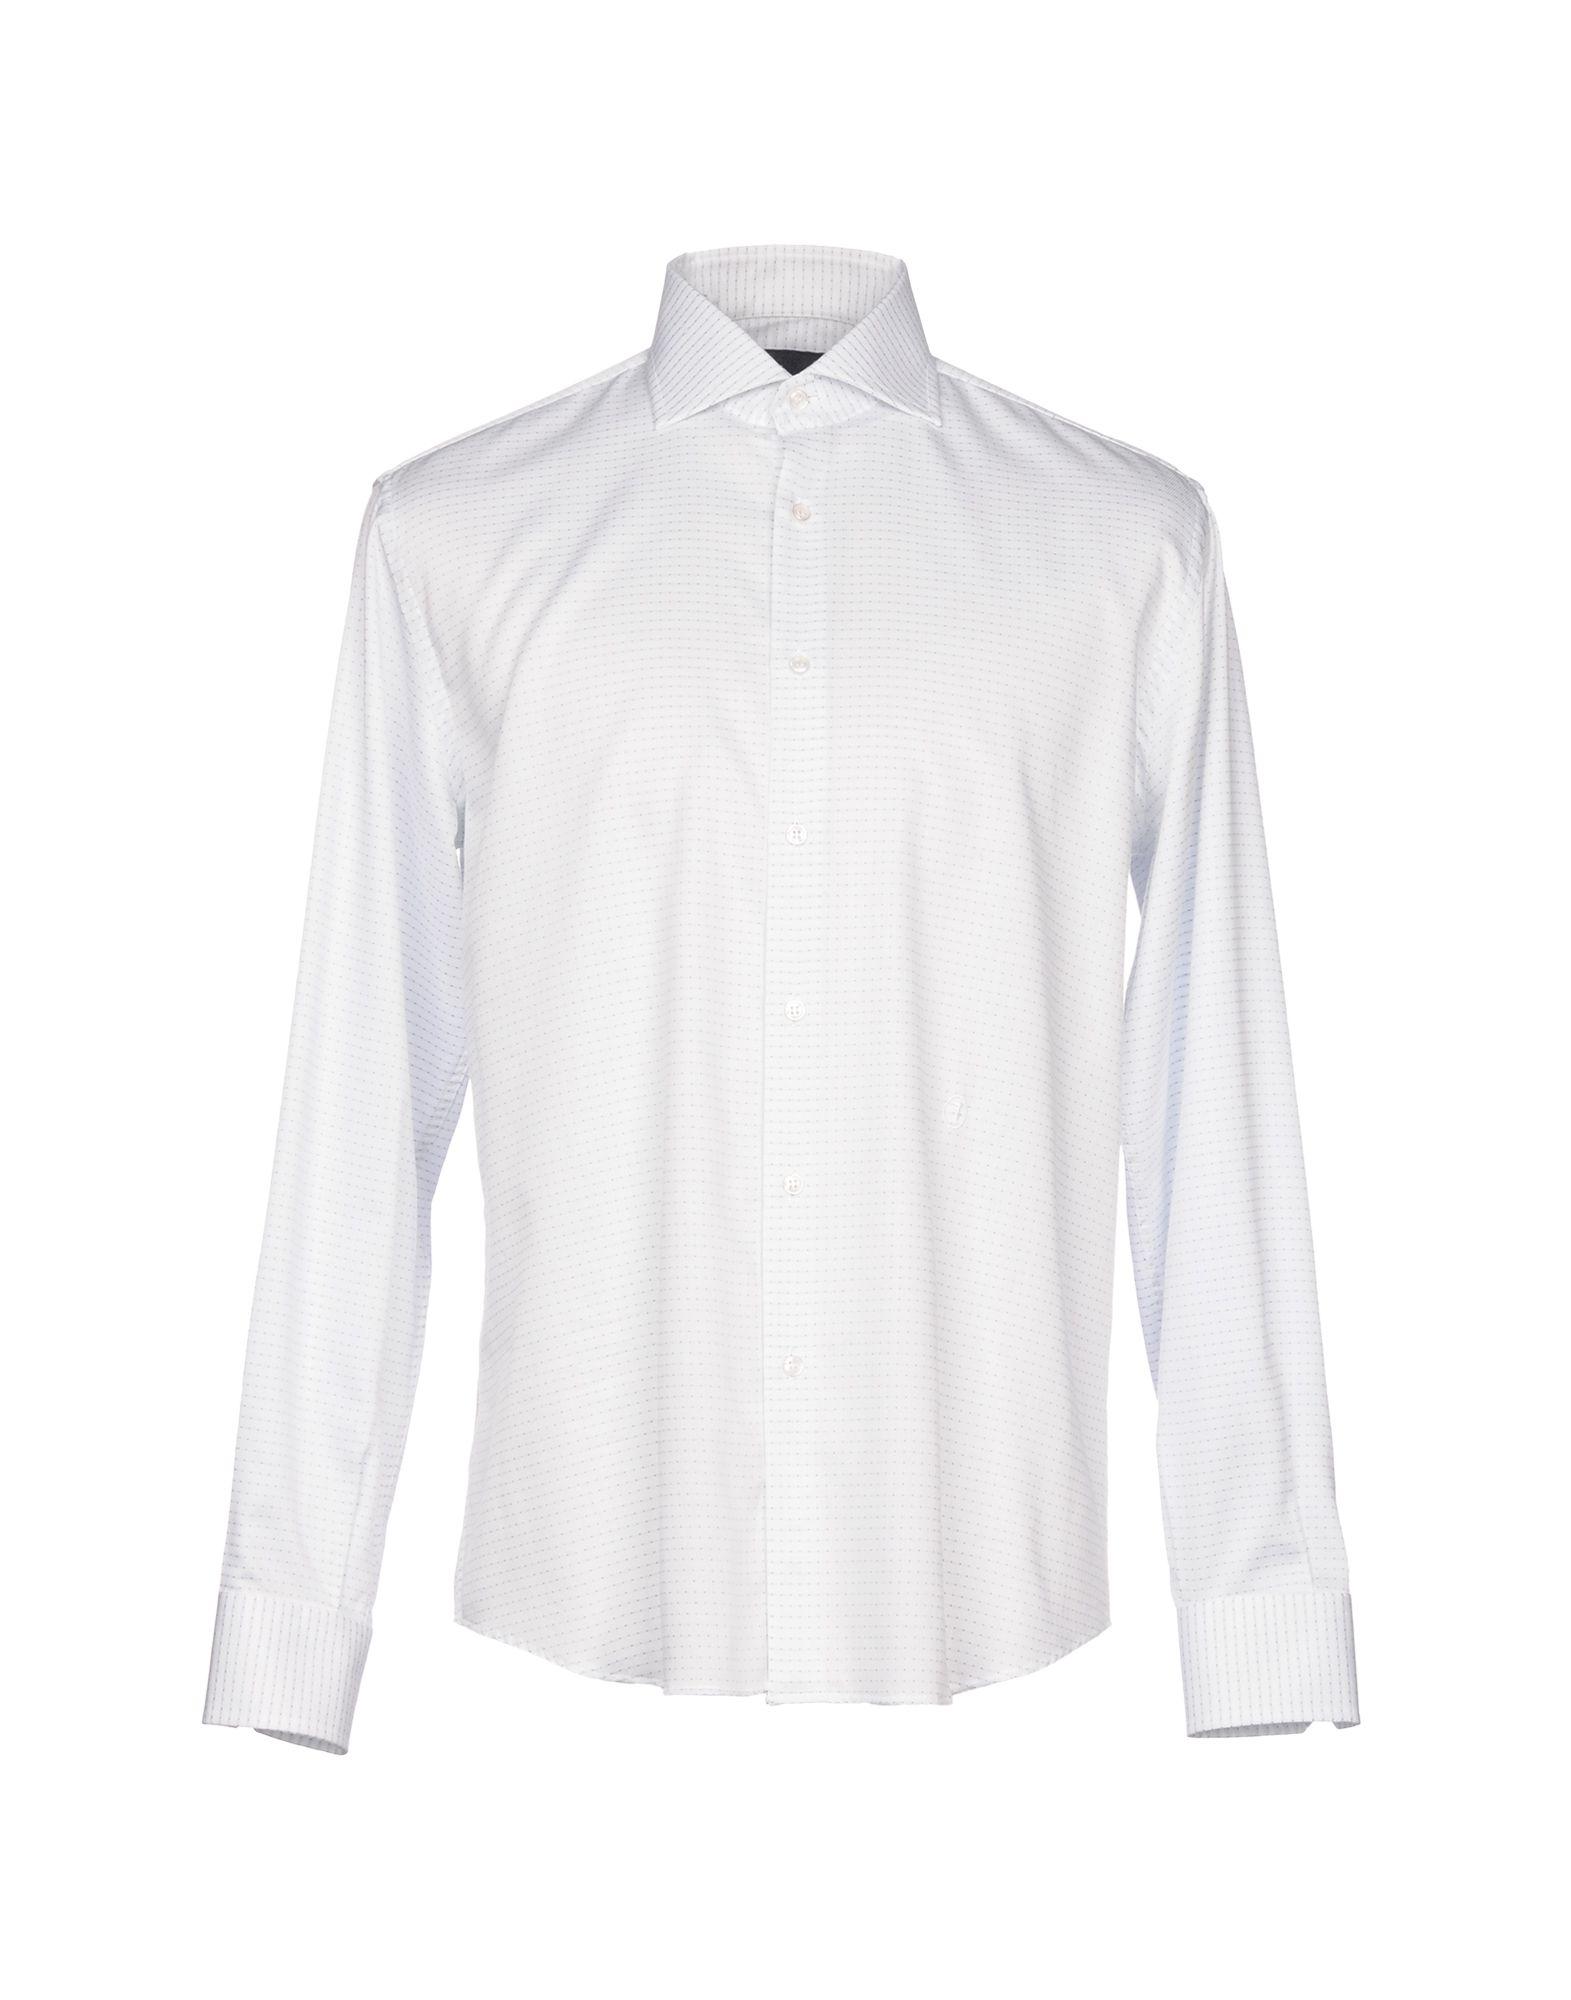 TRU TRUSSARDI Patterned Shirt in White